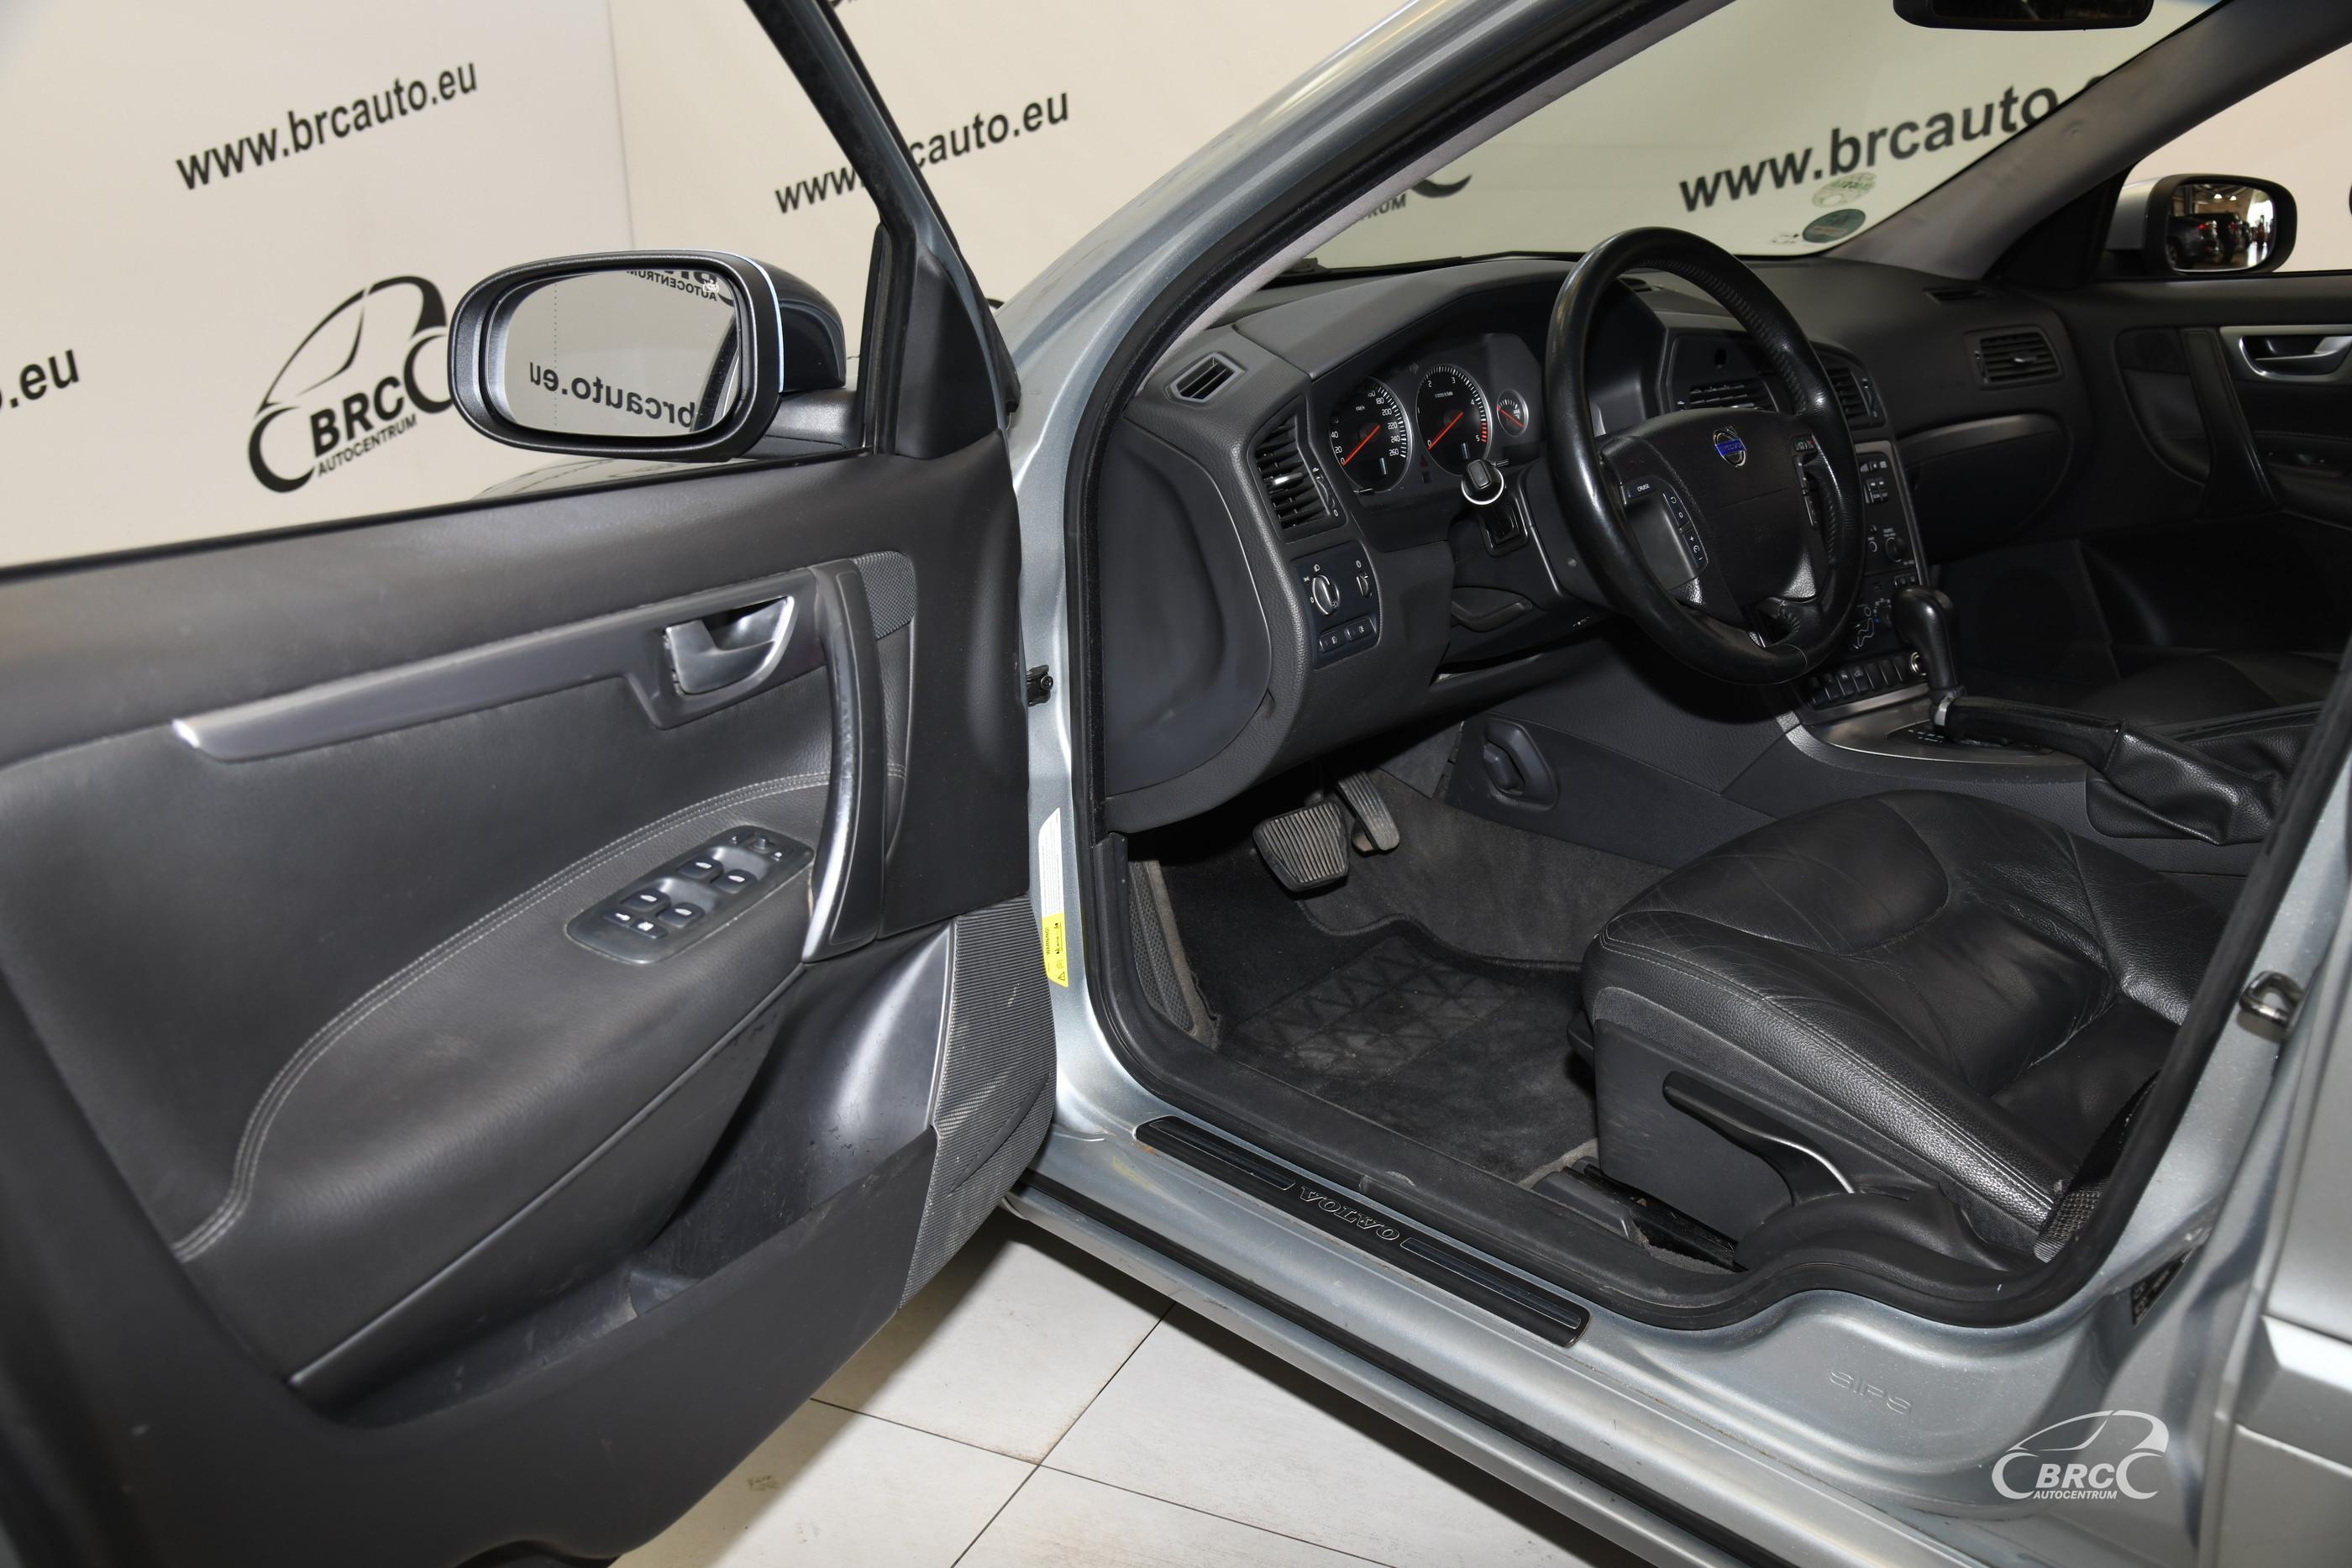 Volvo V70 2.4D Automatas